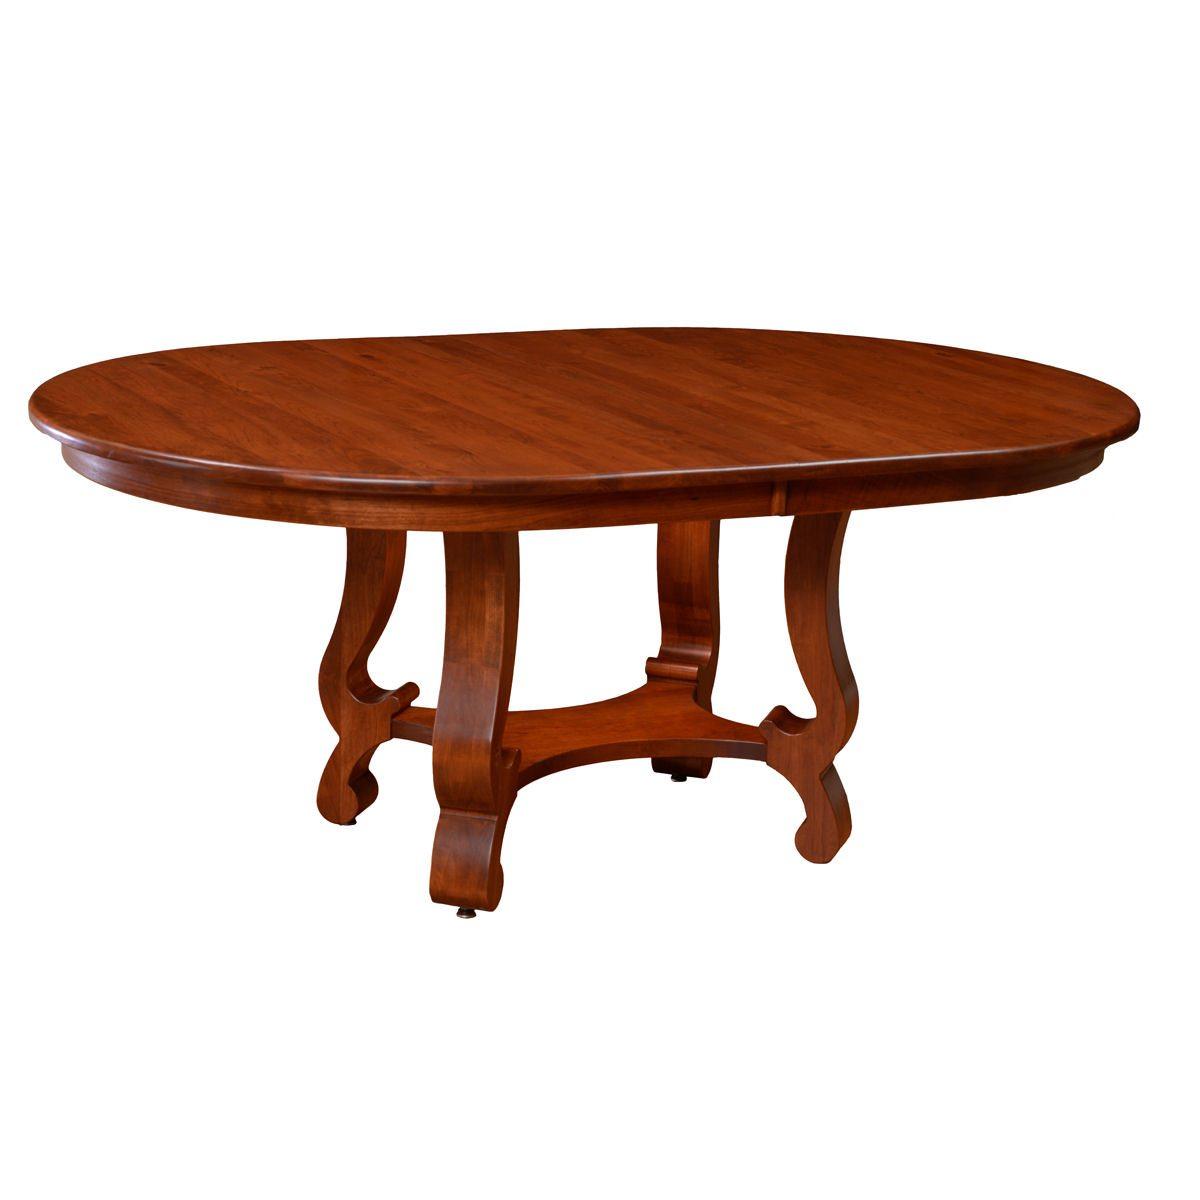 Arlington Dining Collection G08-30 Pedestal Table